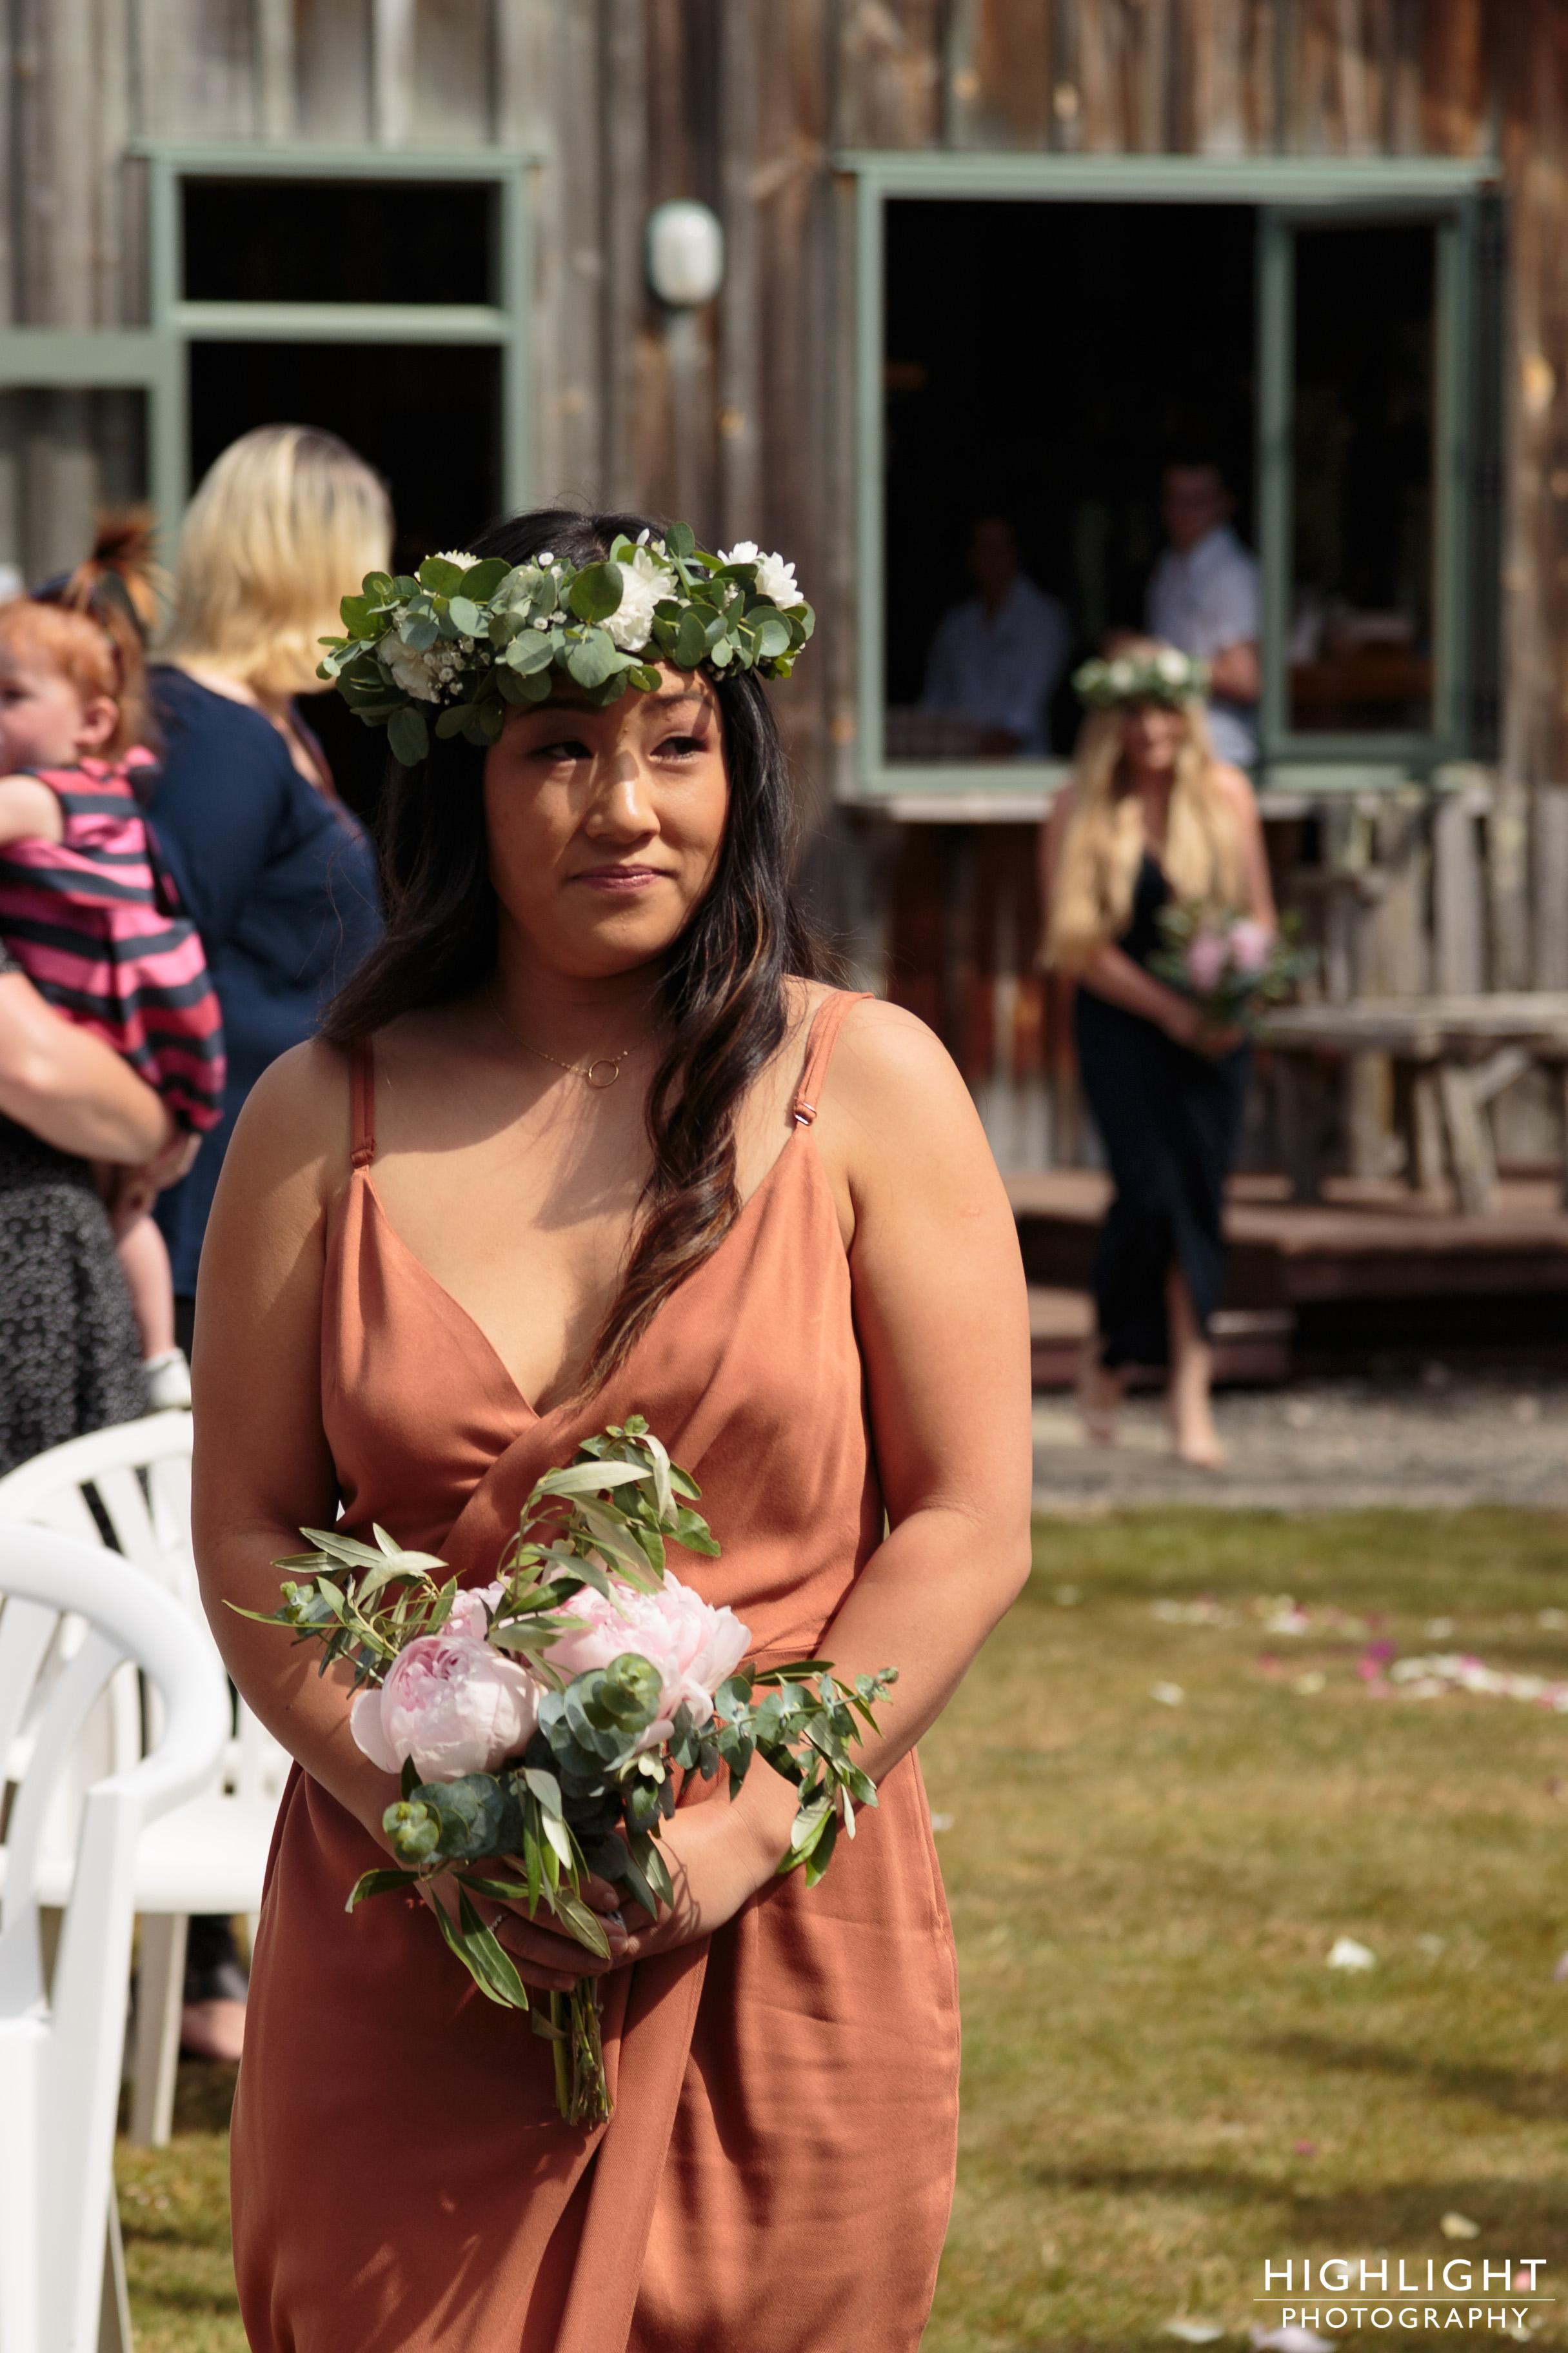 highlight-wedding-photography-new-zealand-makoura-lodge-wedding-53.jpg